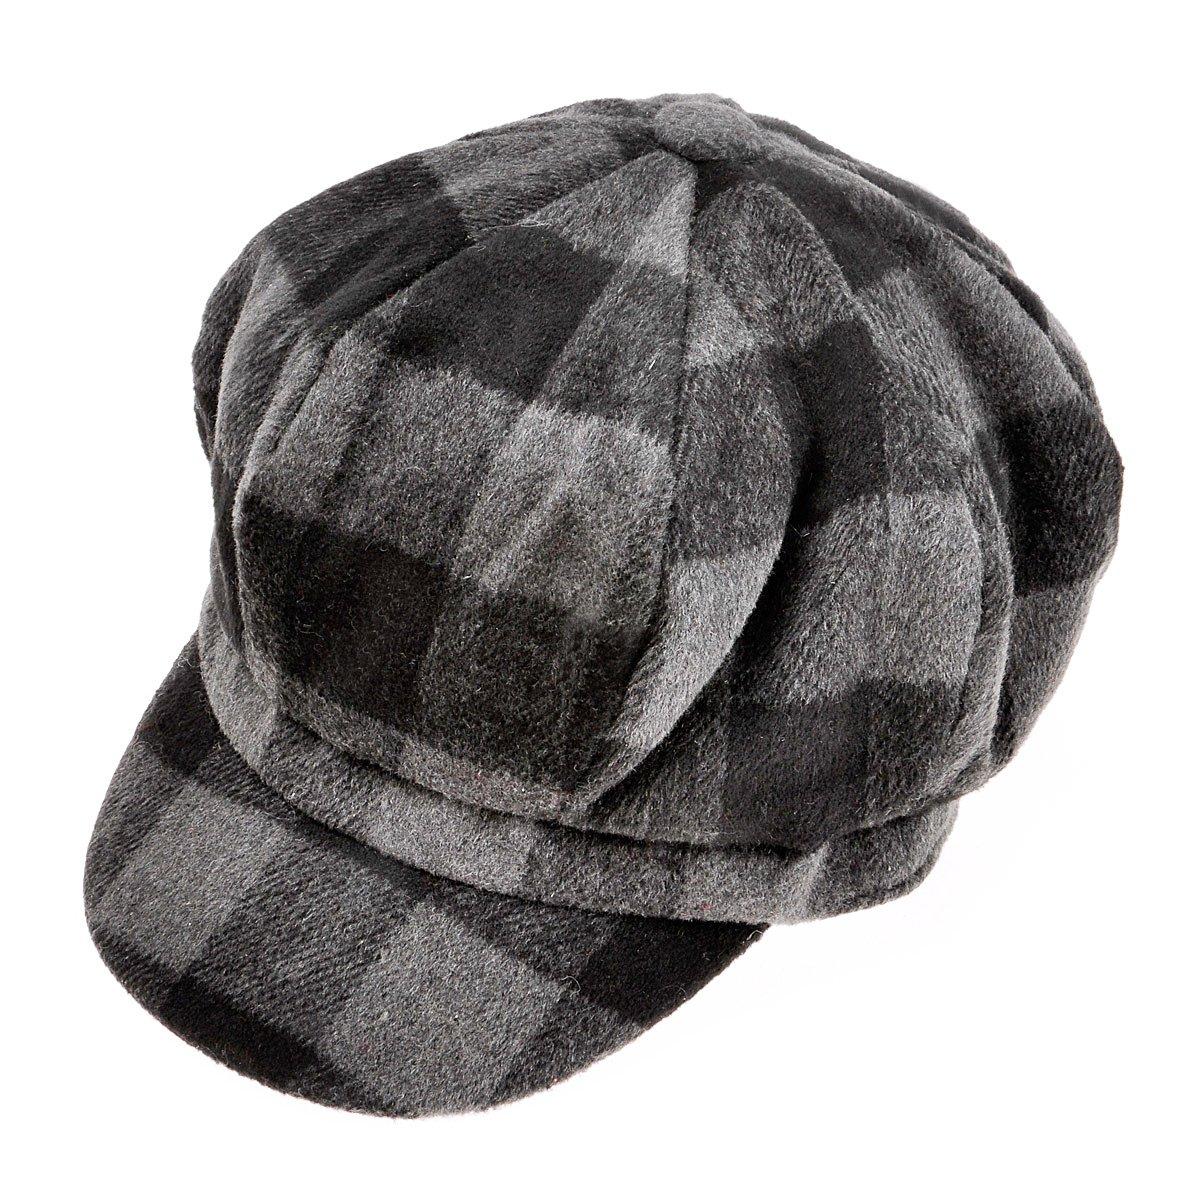 Womens Classic Newsboy Caps Visor 8 Panel Gatsby Apple Cabbie Hat Black ZYJ-MZ-047-BK-1